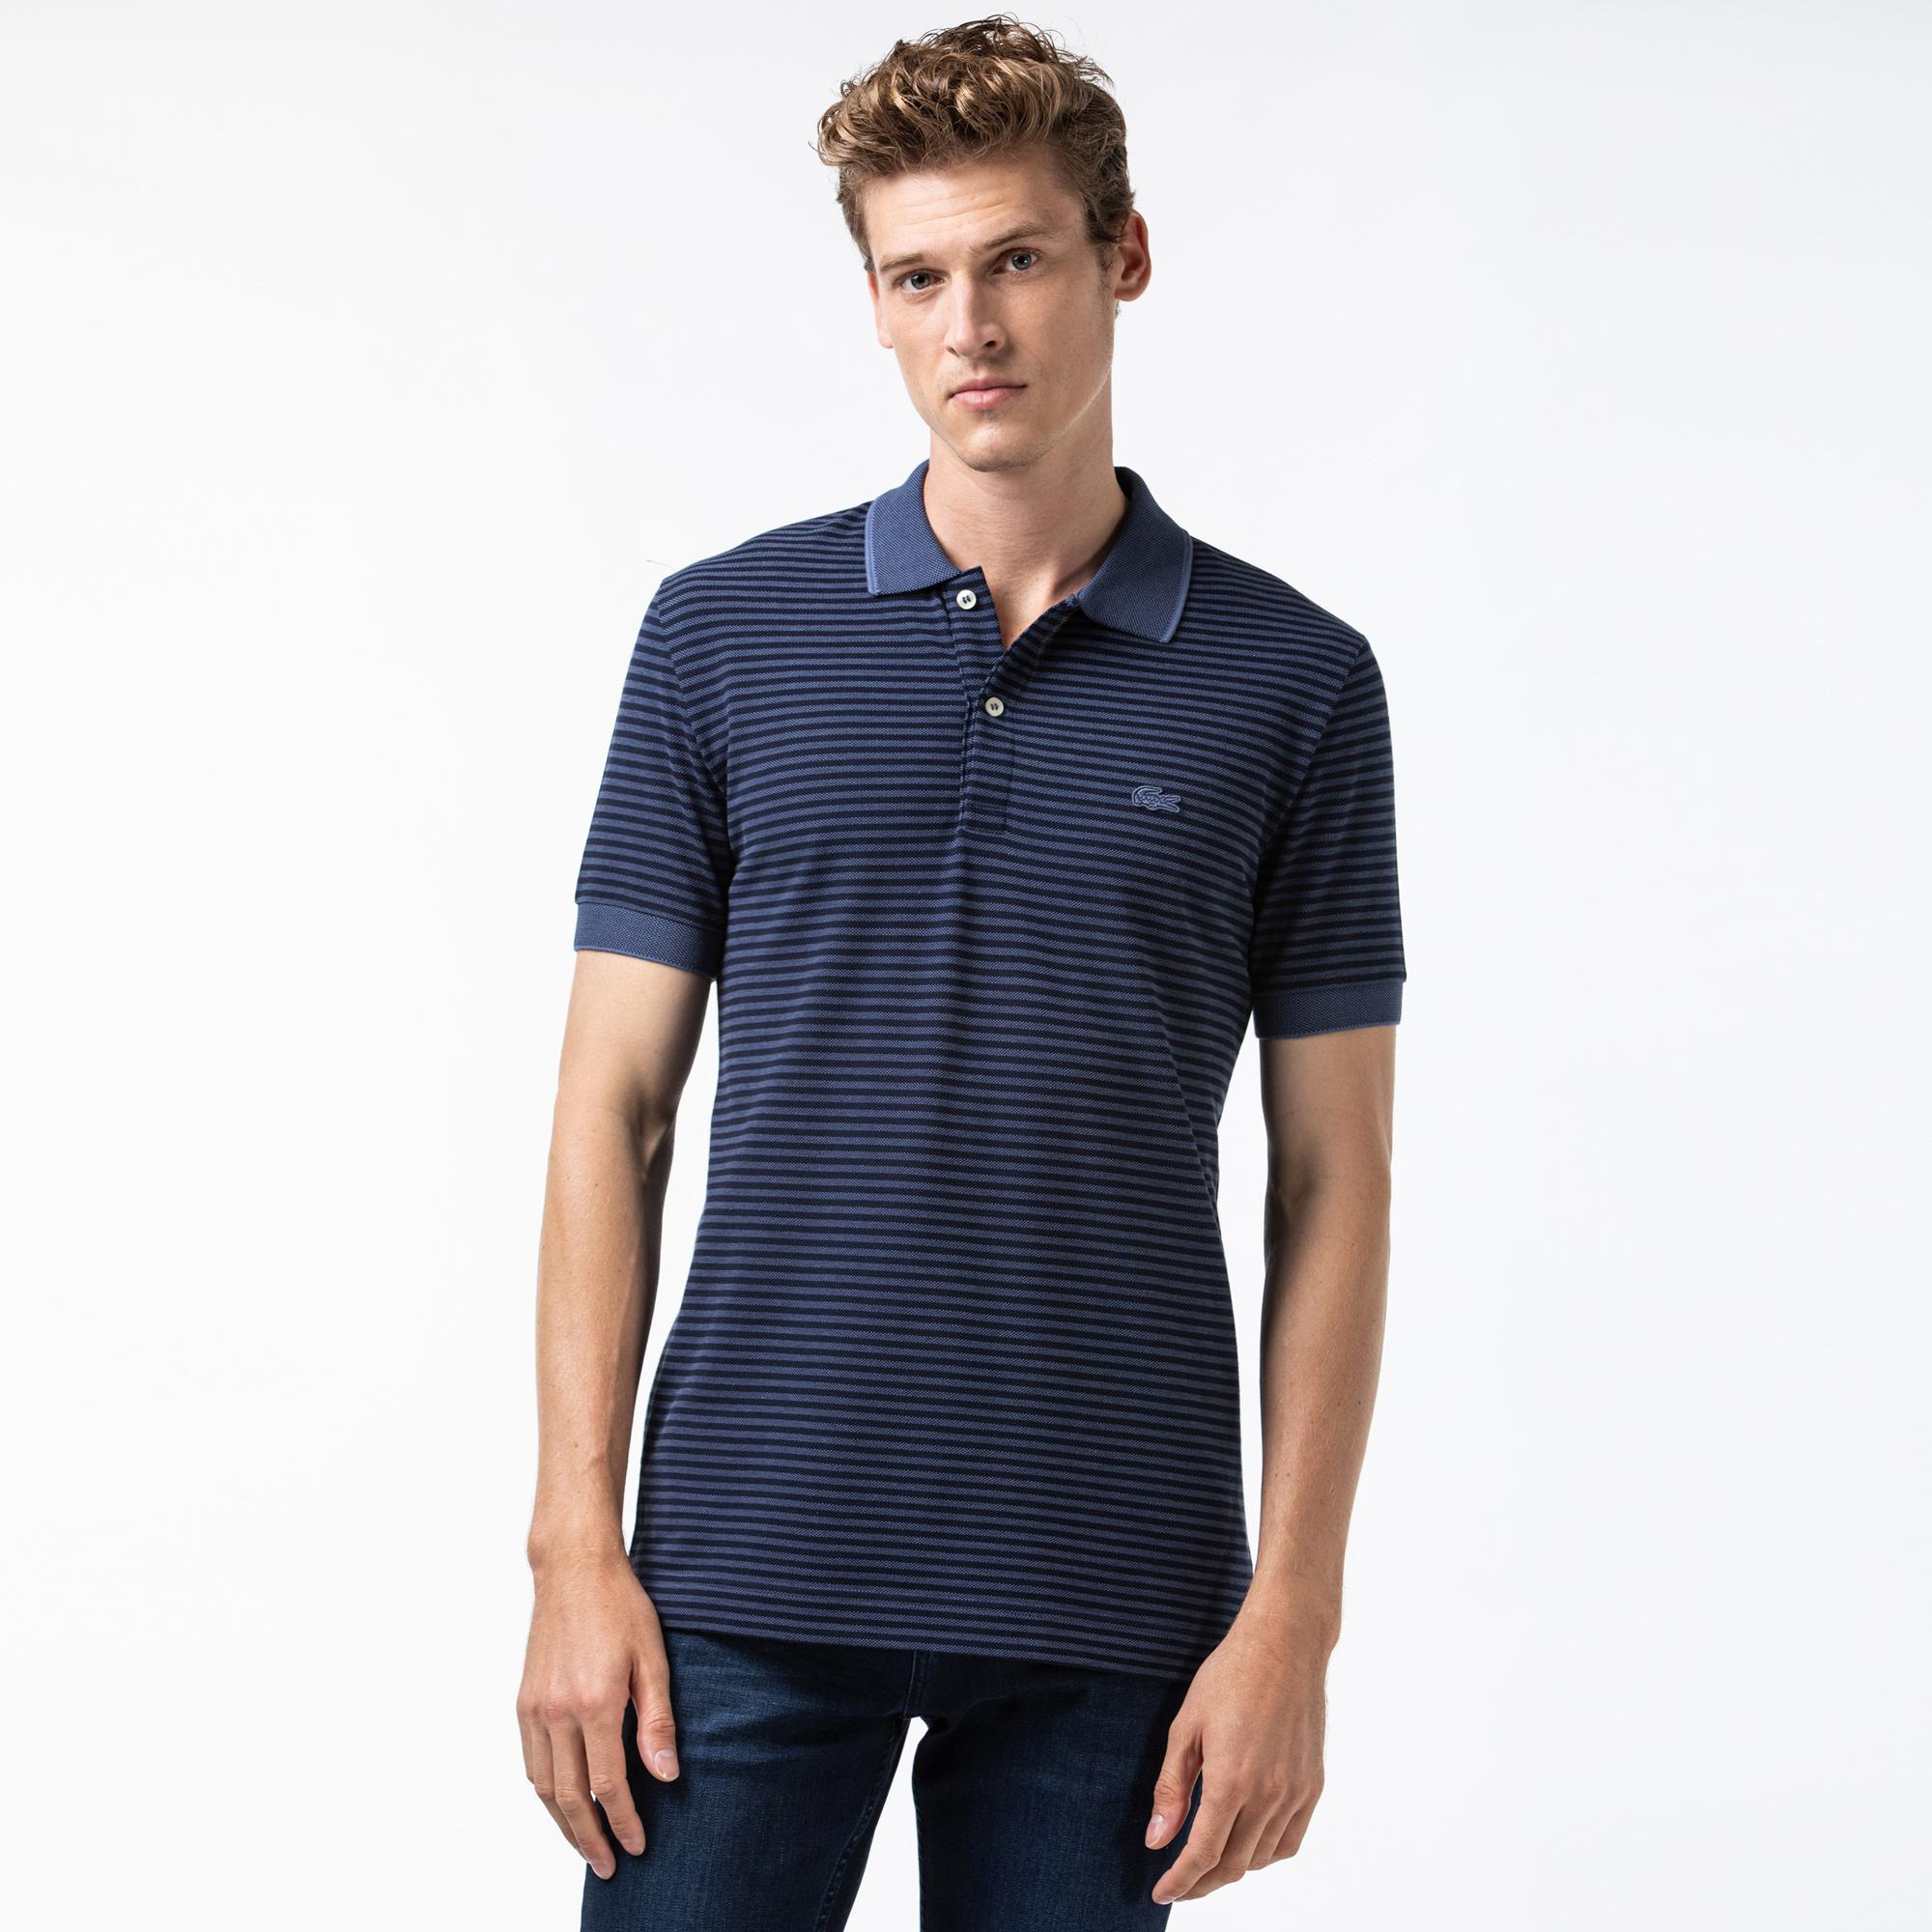 Lacoste Men's Regular Fit Striped Polo